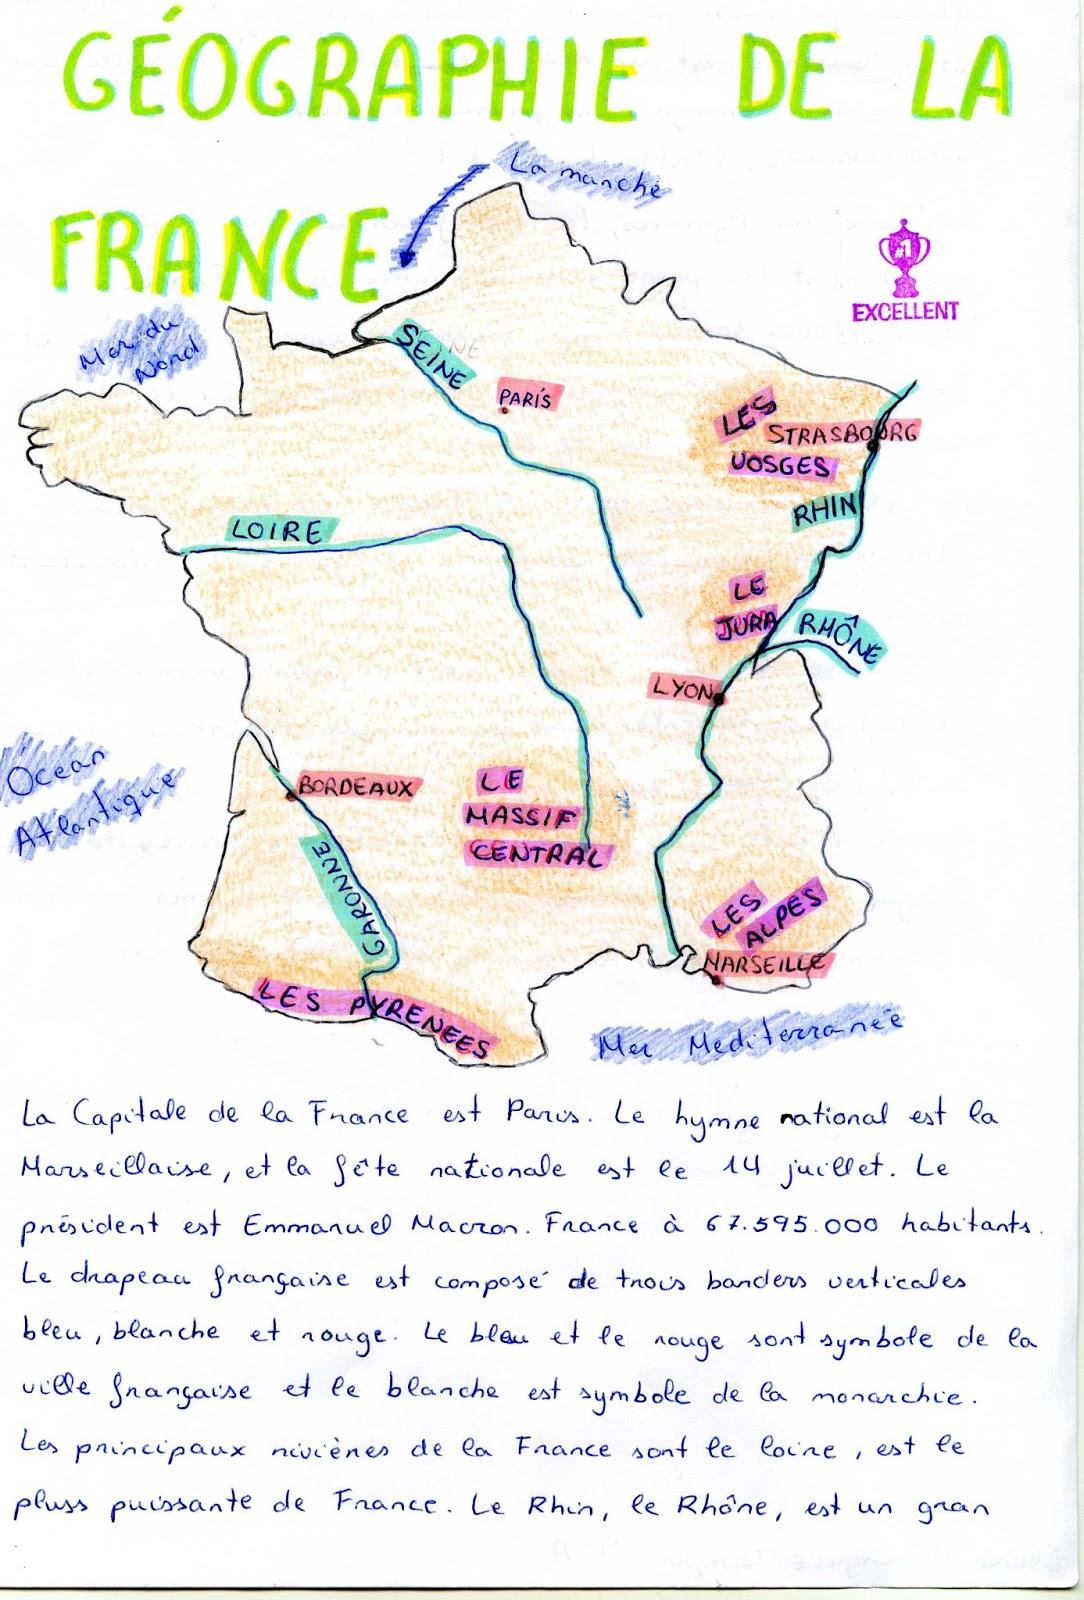 Le Coqui Hebdomadaire La Geographie De La France